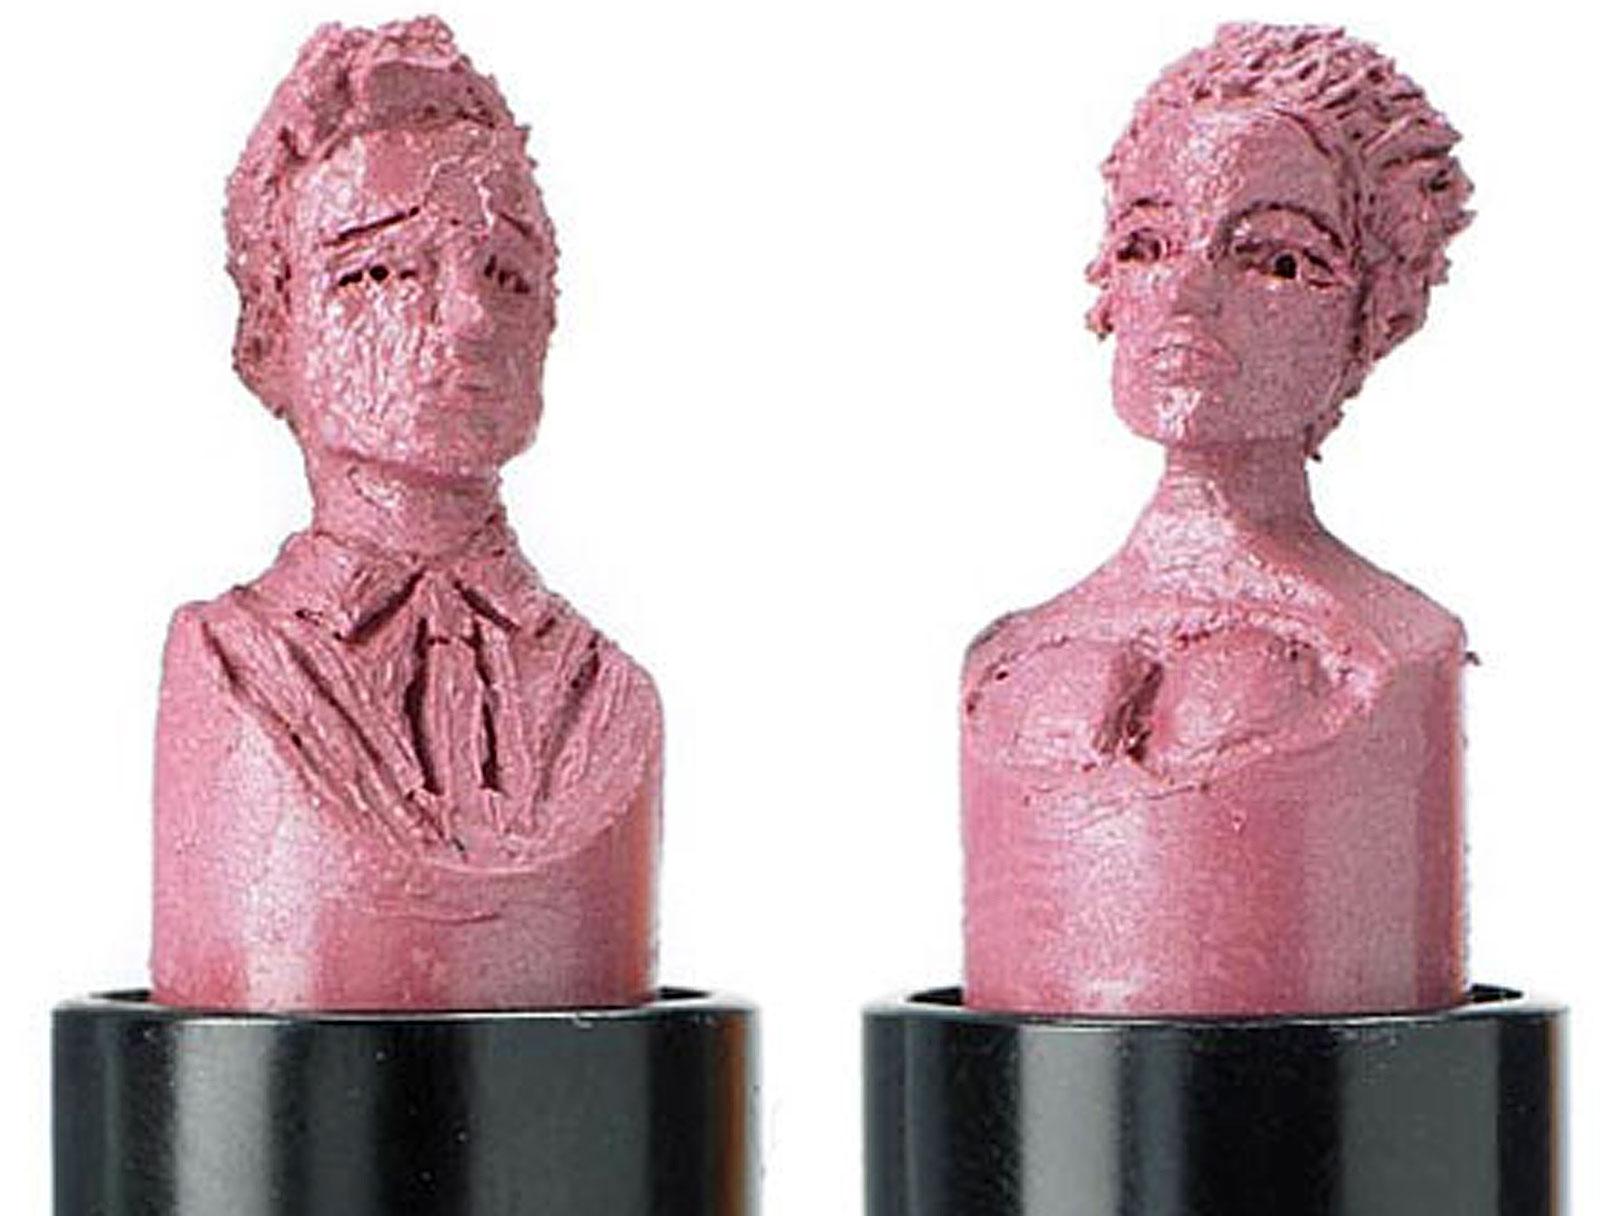 Brad Pitt and Angelina Jolie Receive Lipstick Service